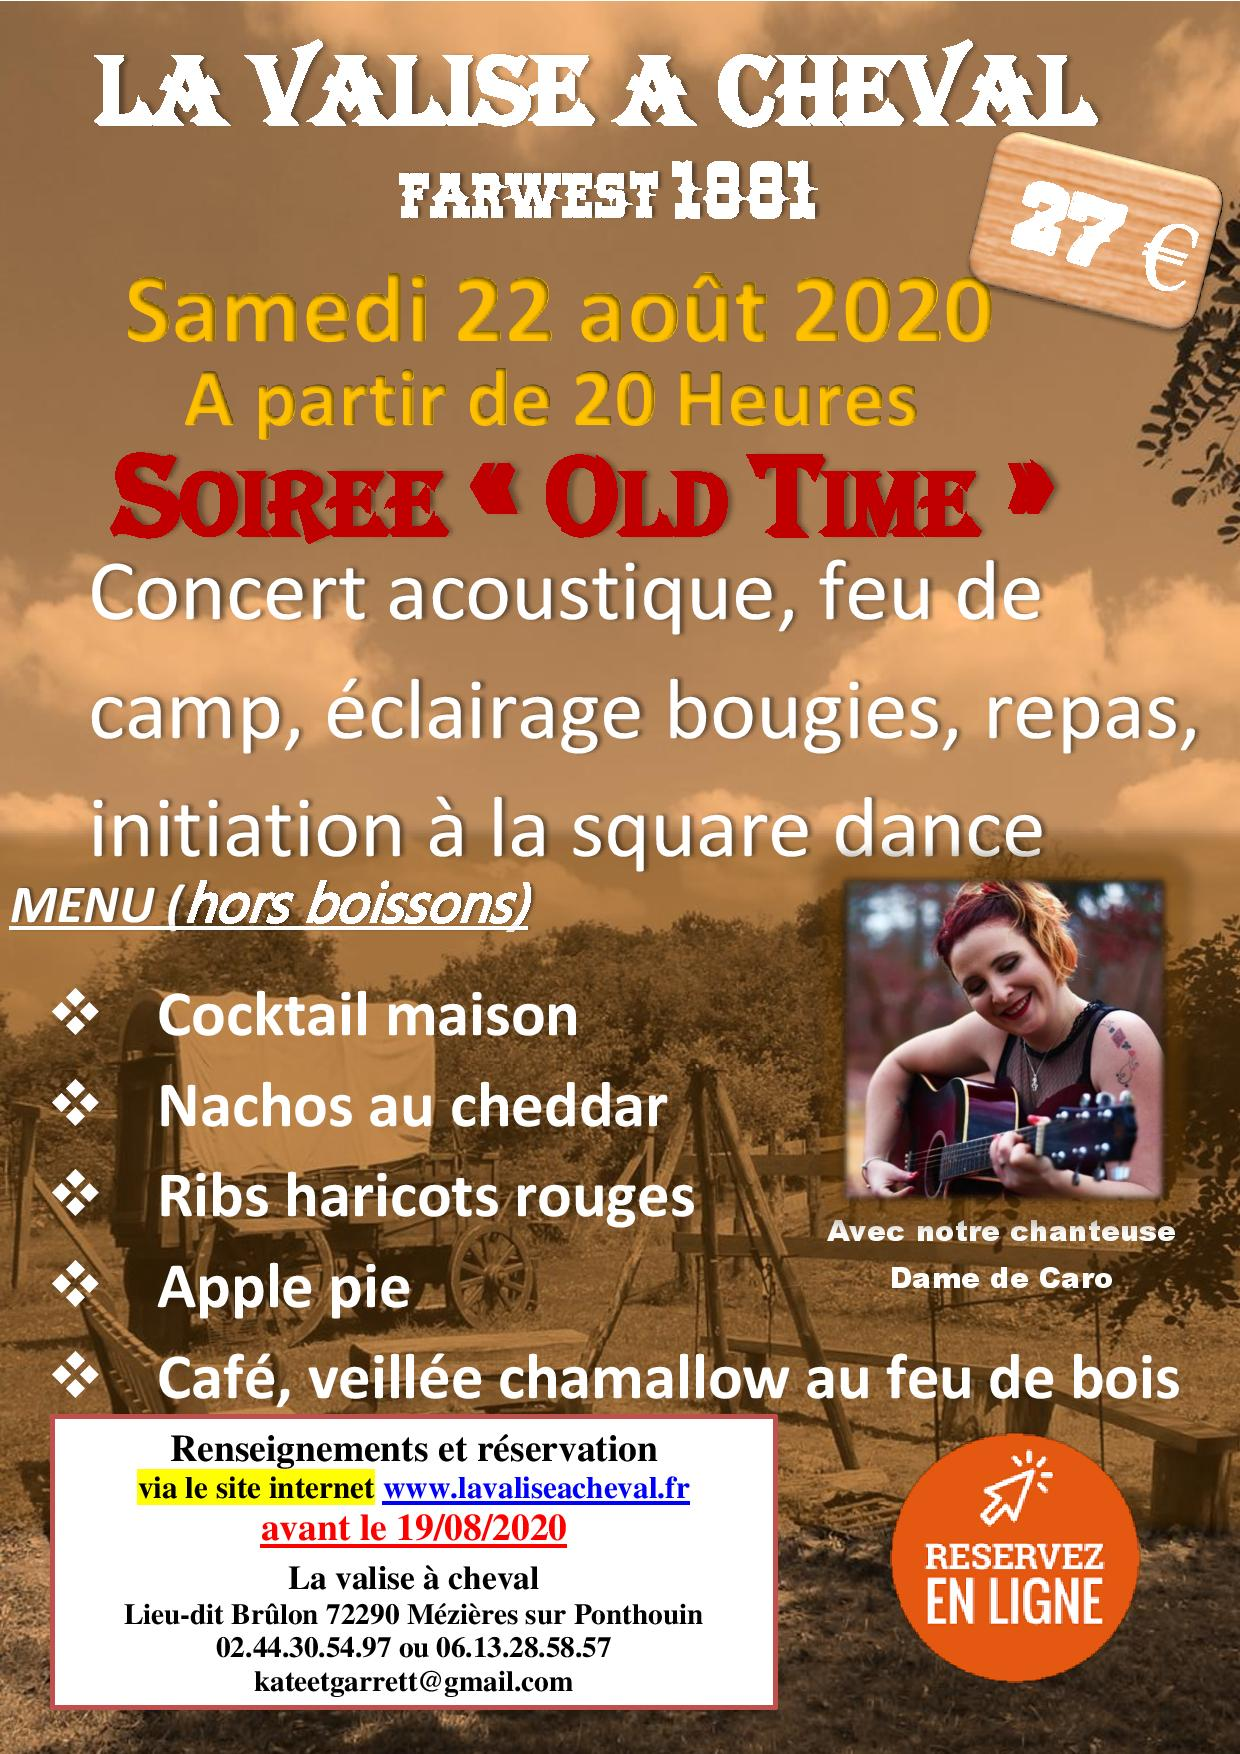 Soirée Old samedi 22 août 2020